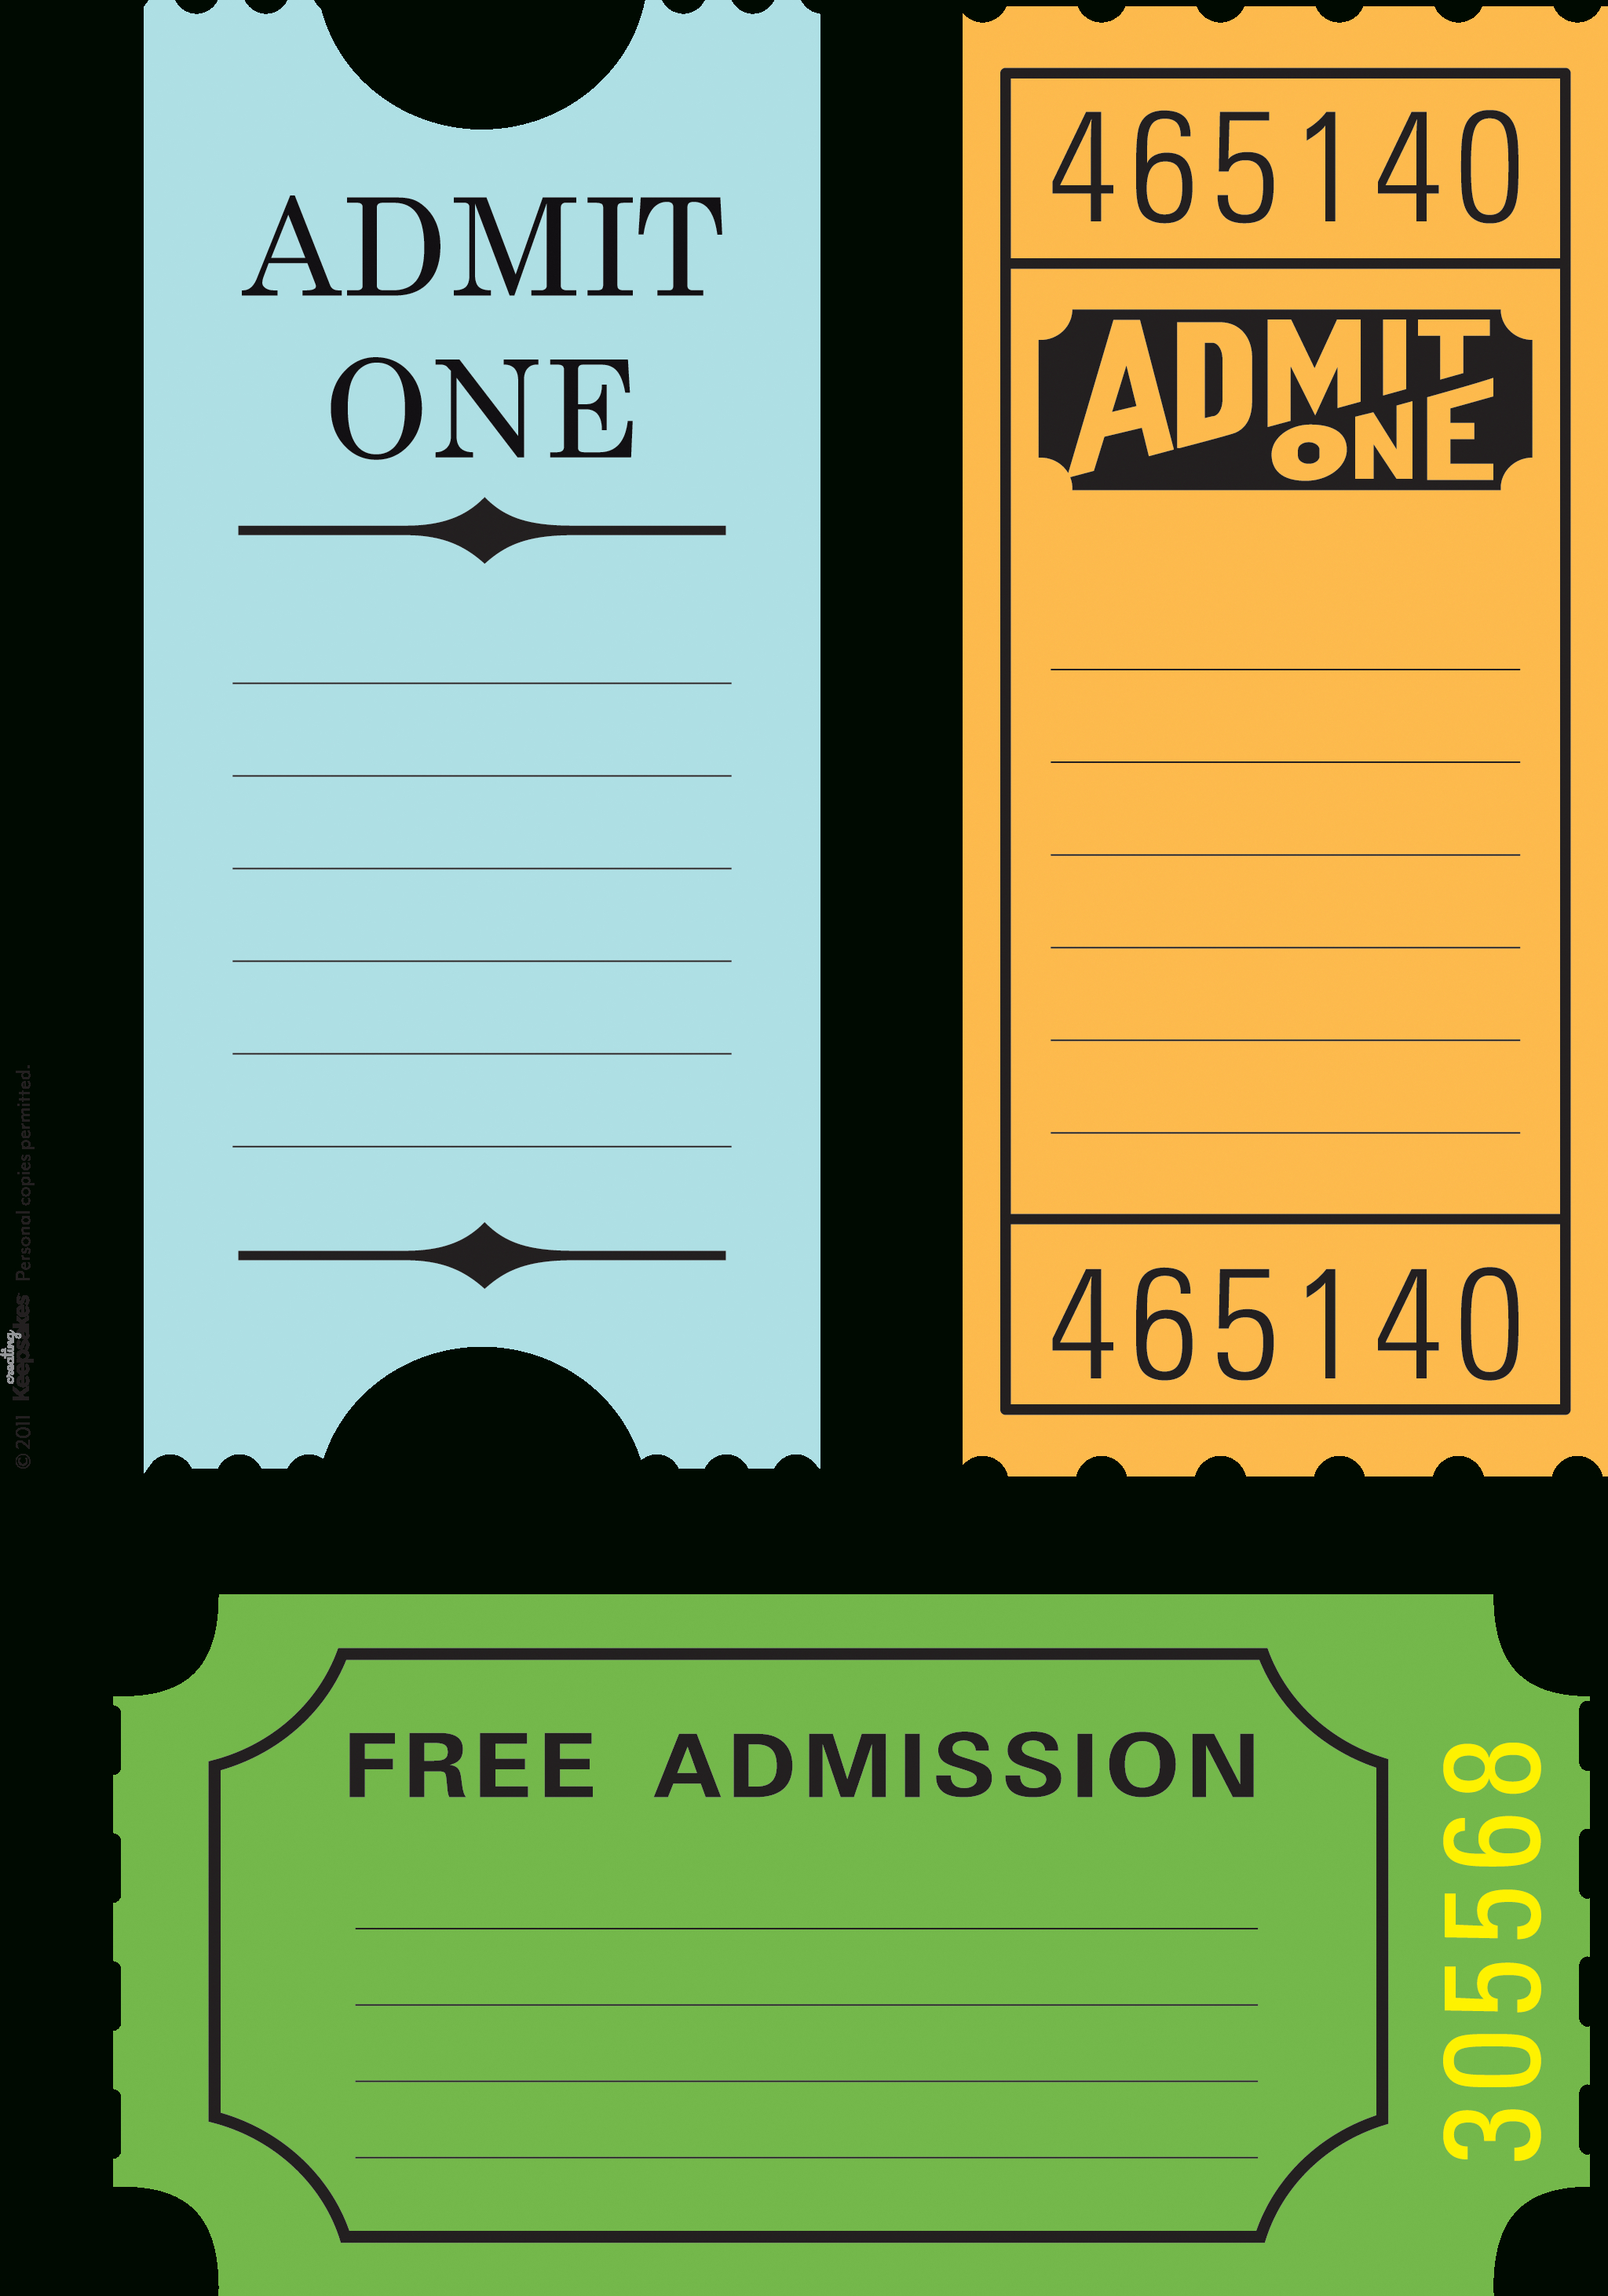 Pinsheryl Johnson On Free Digital Scrapbook | Printable Tickets - Create Tickets Free Printable